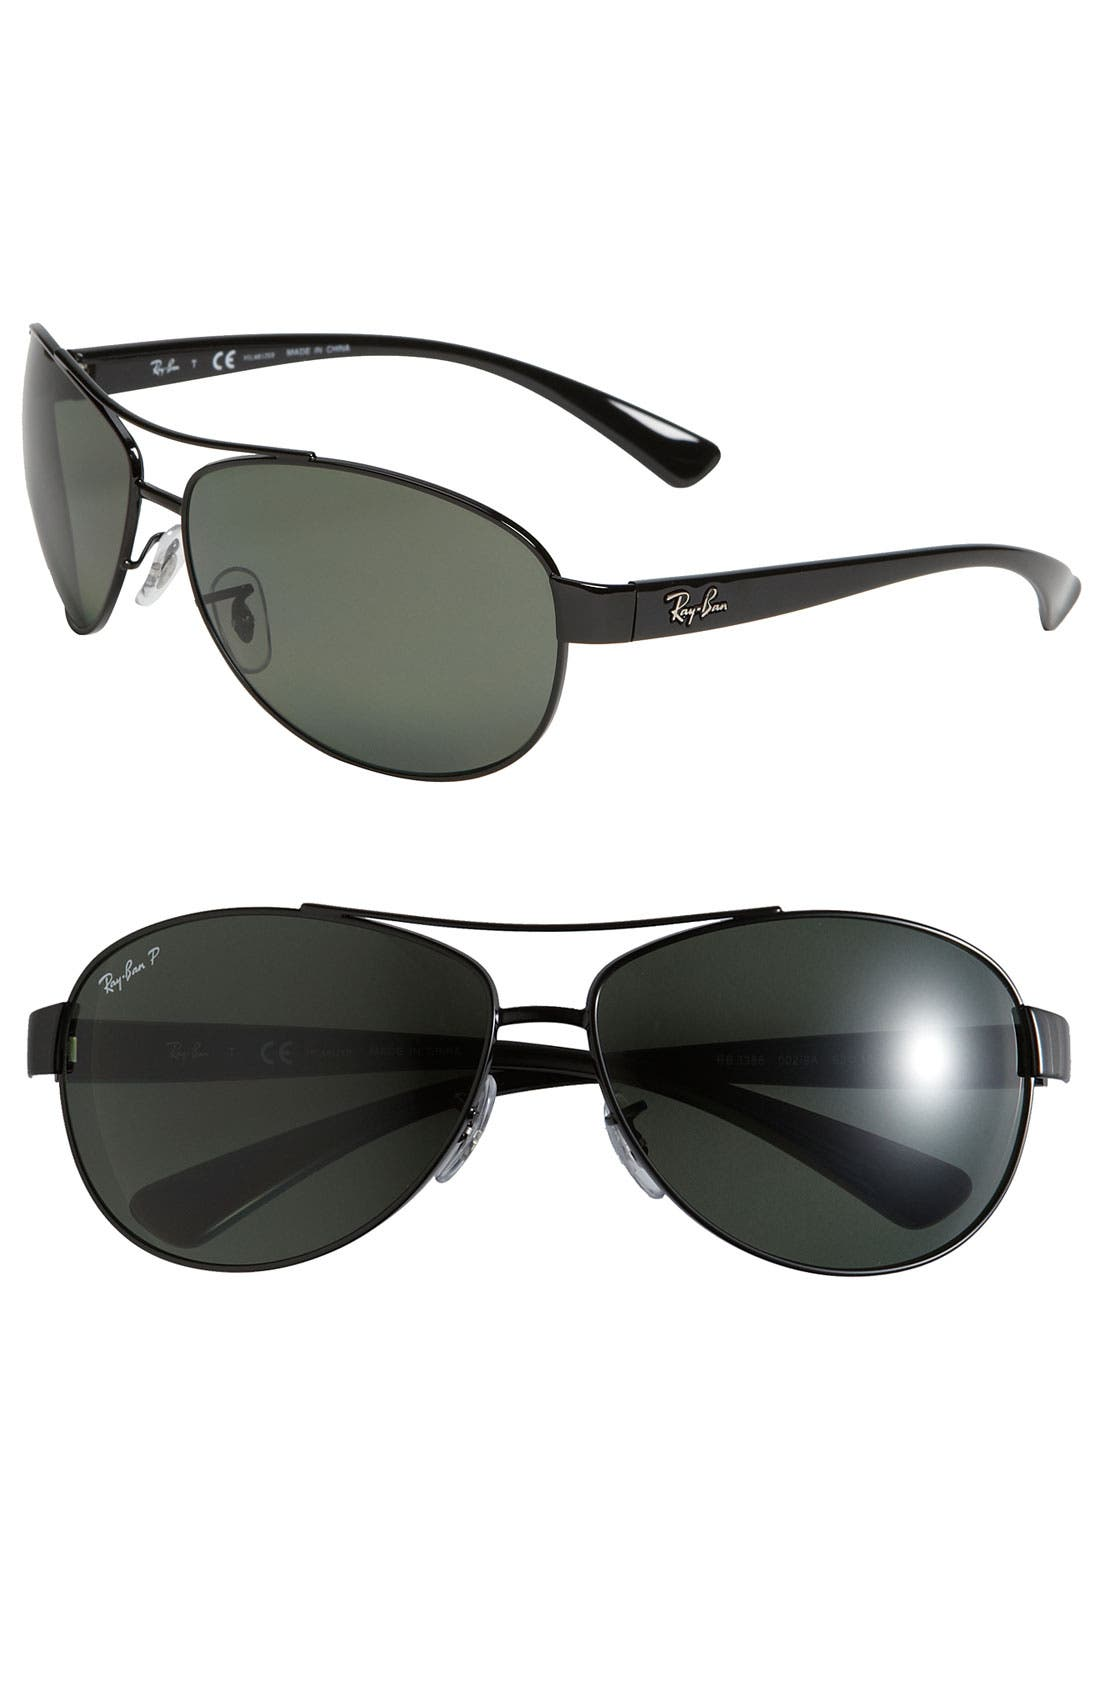 Main Image - Ray-Ban Nylon 63mm Aviator Sunglasses